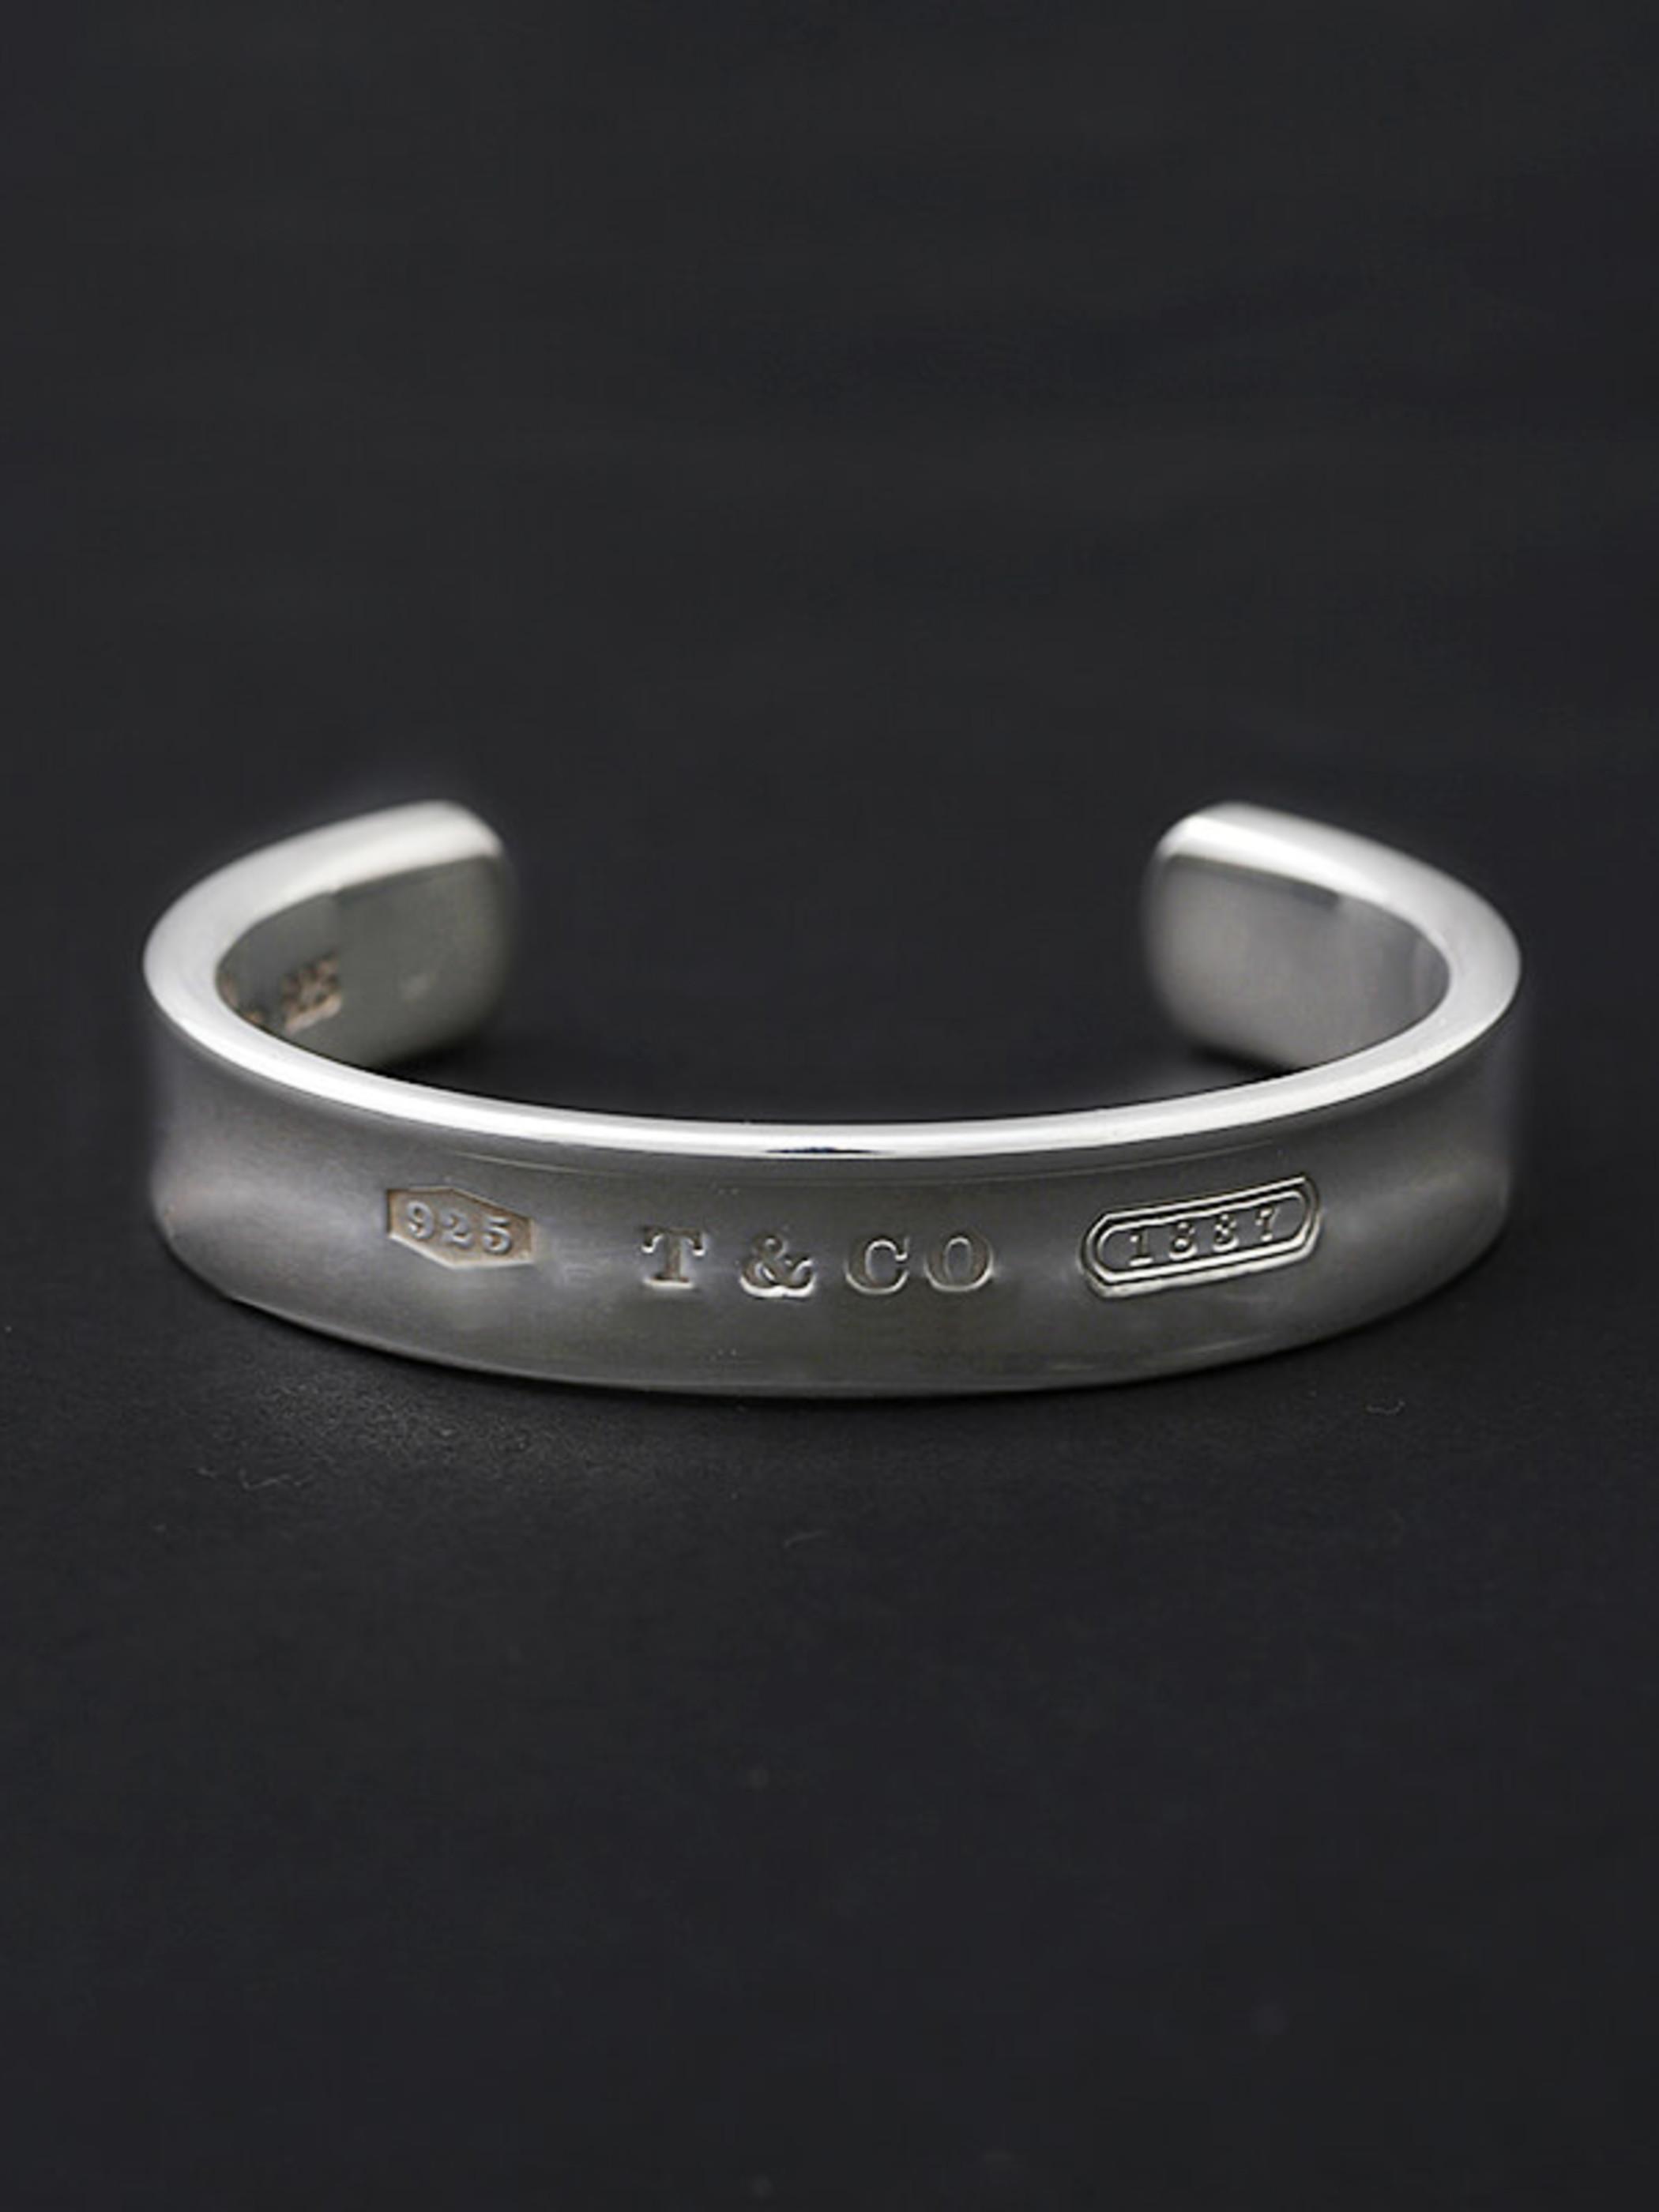 Used / Tiffany & Co. / Old Bracelet / Sterling Silver 925